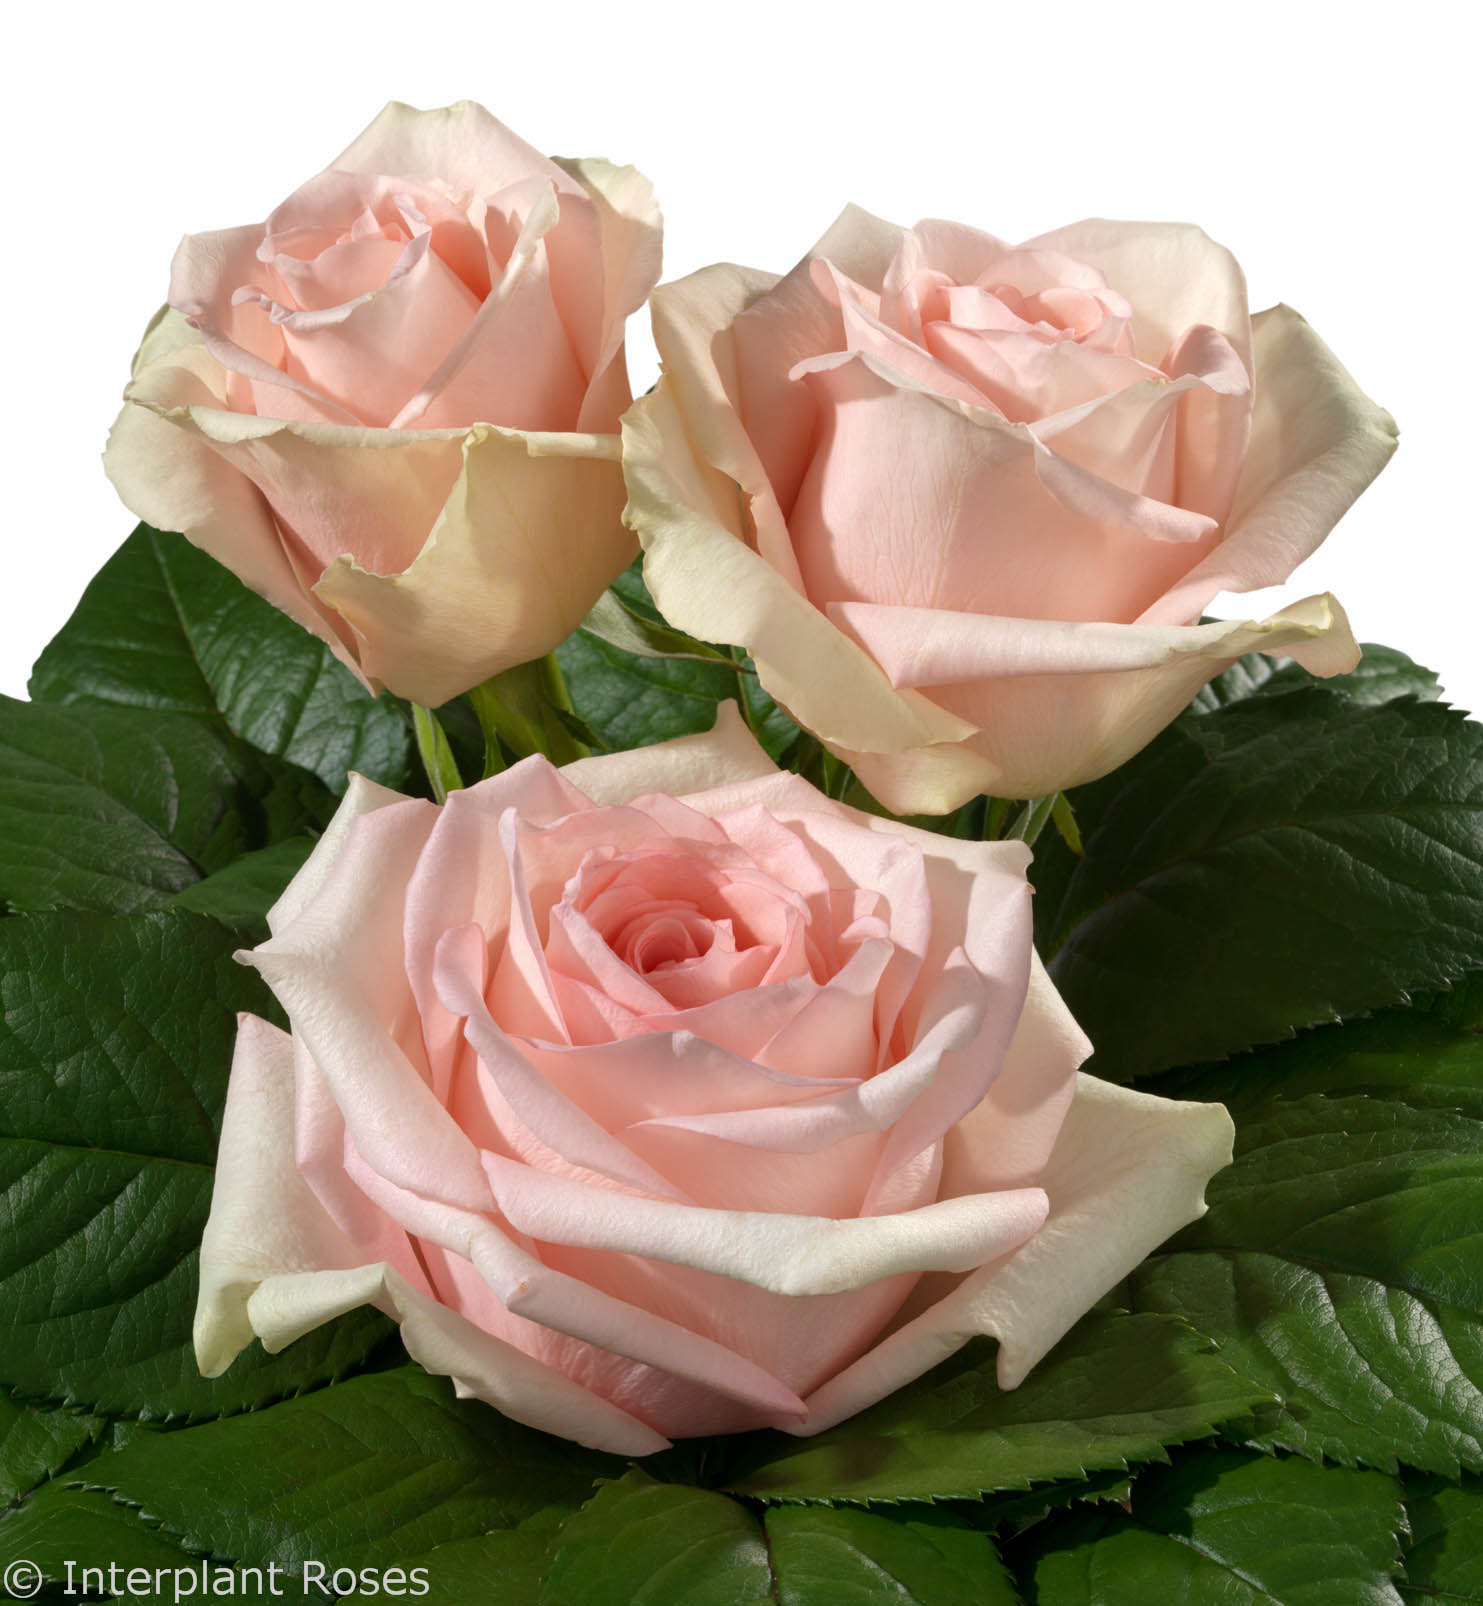 Interplant Roses breeder of Hybrid Tea Roses